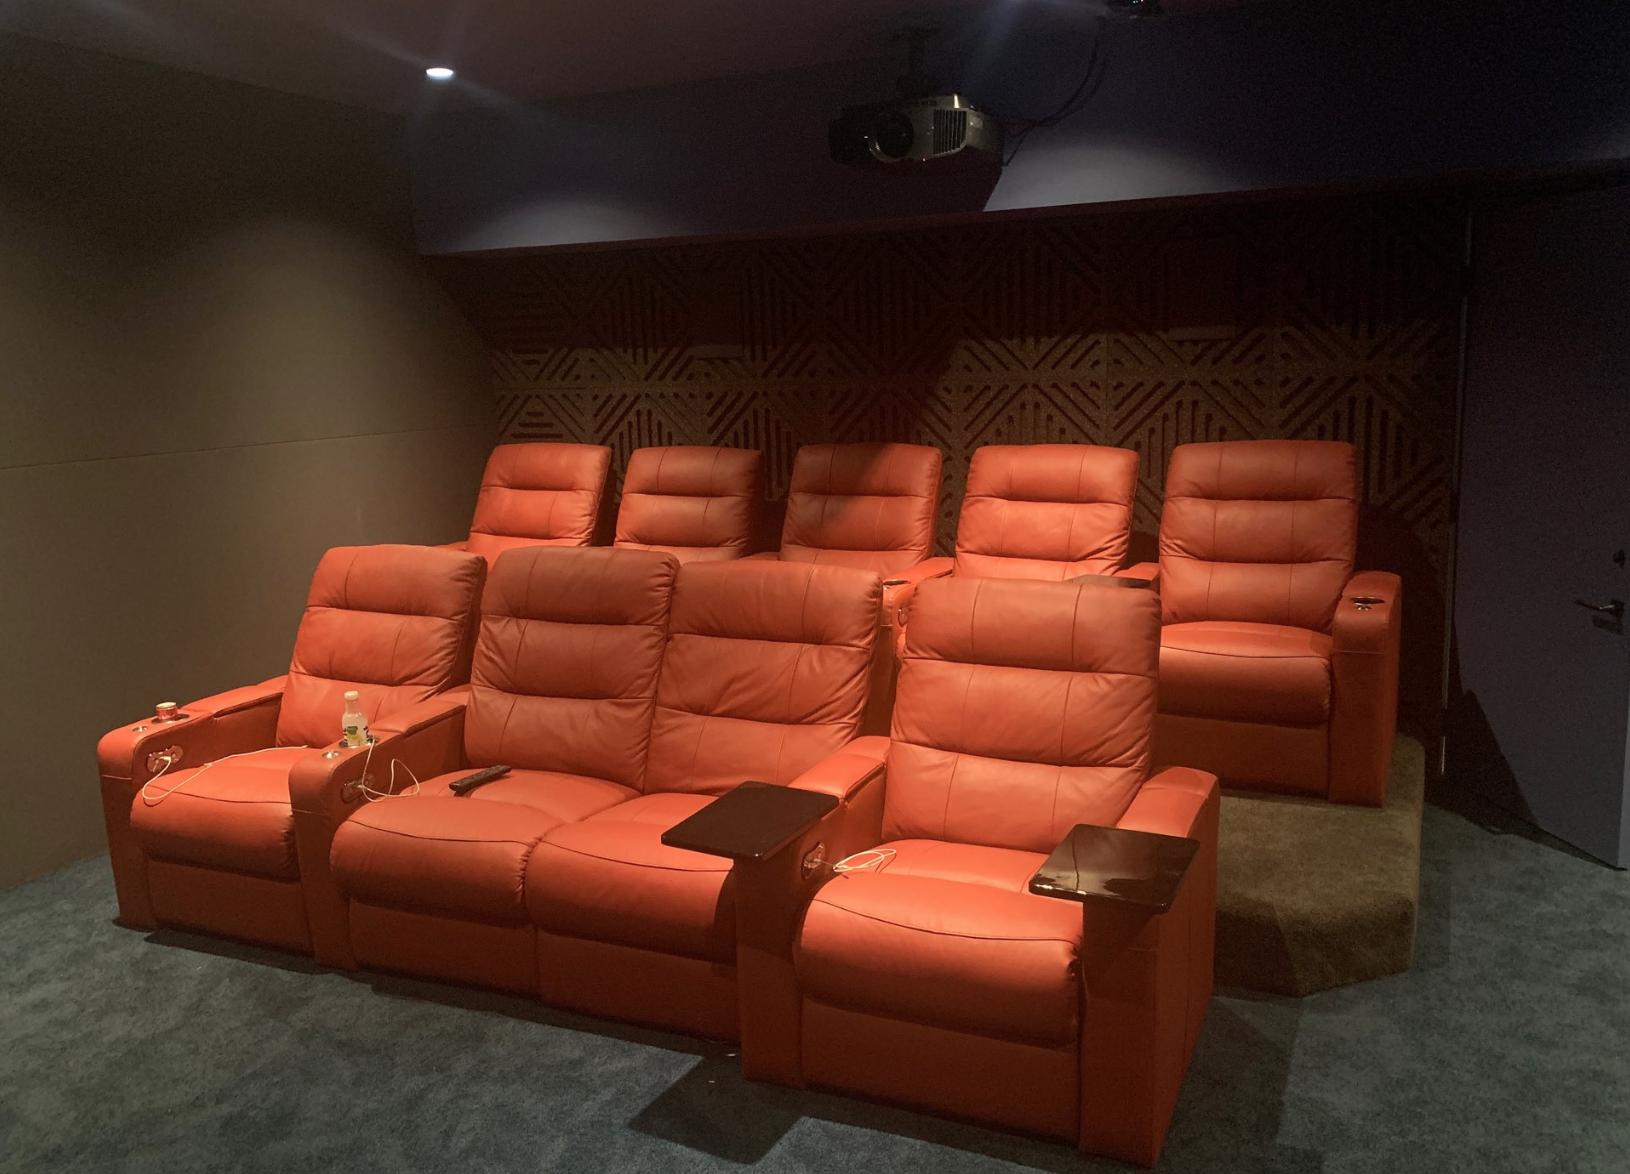 06-theater4